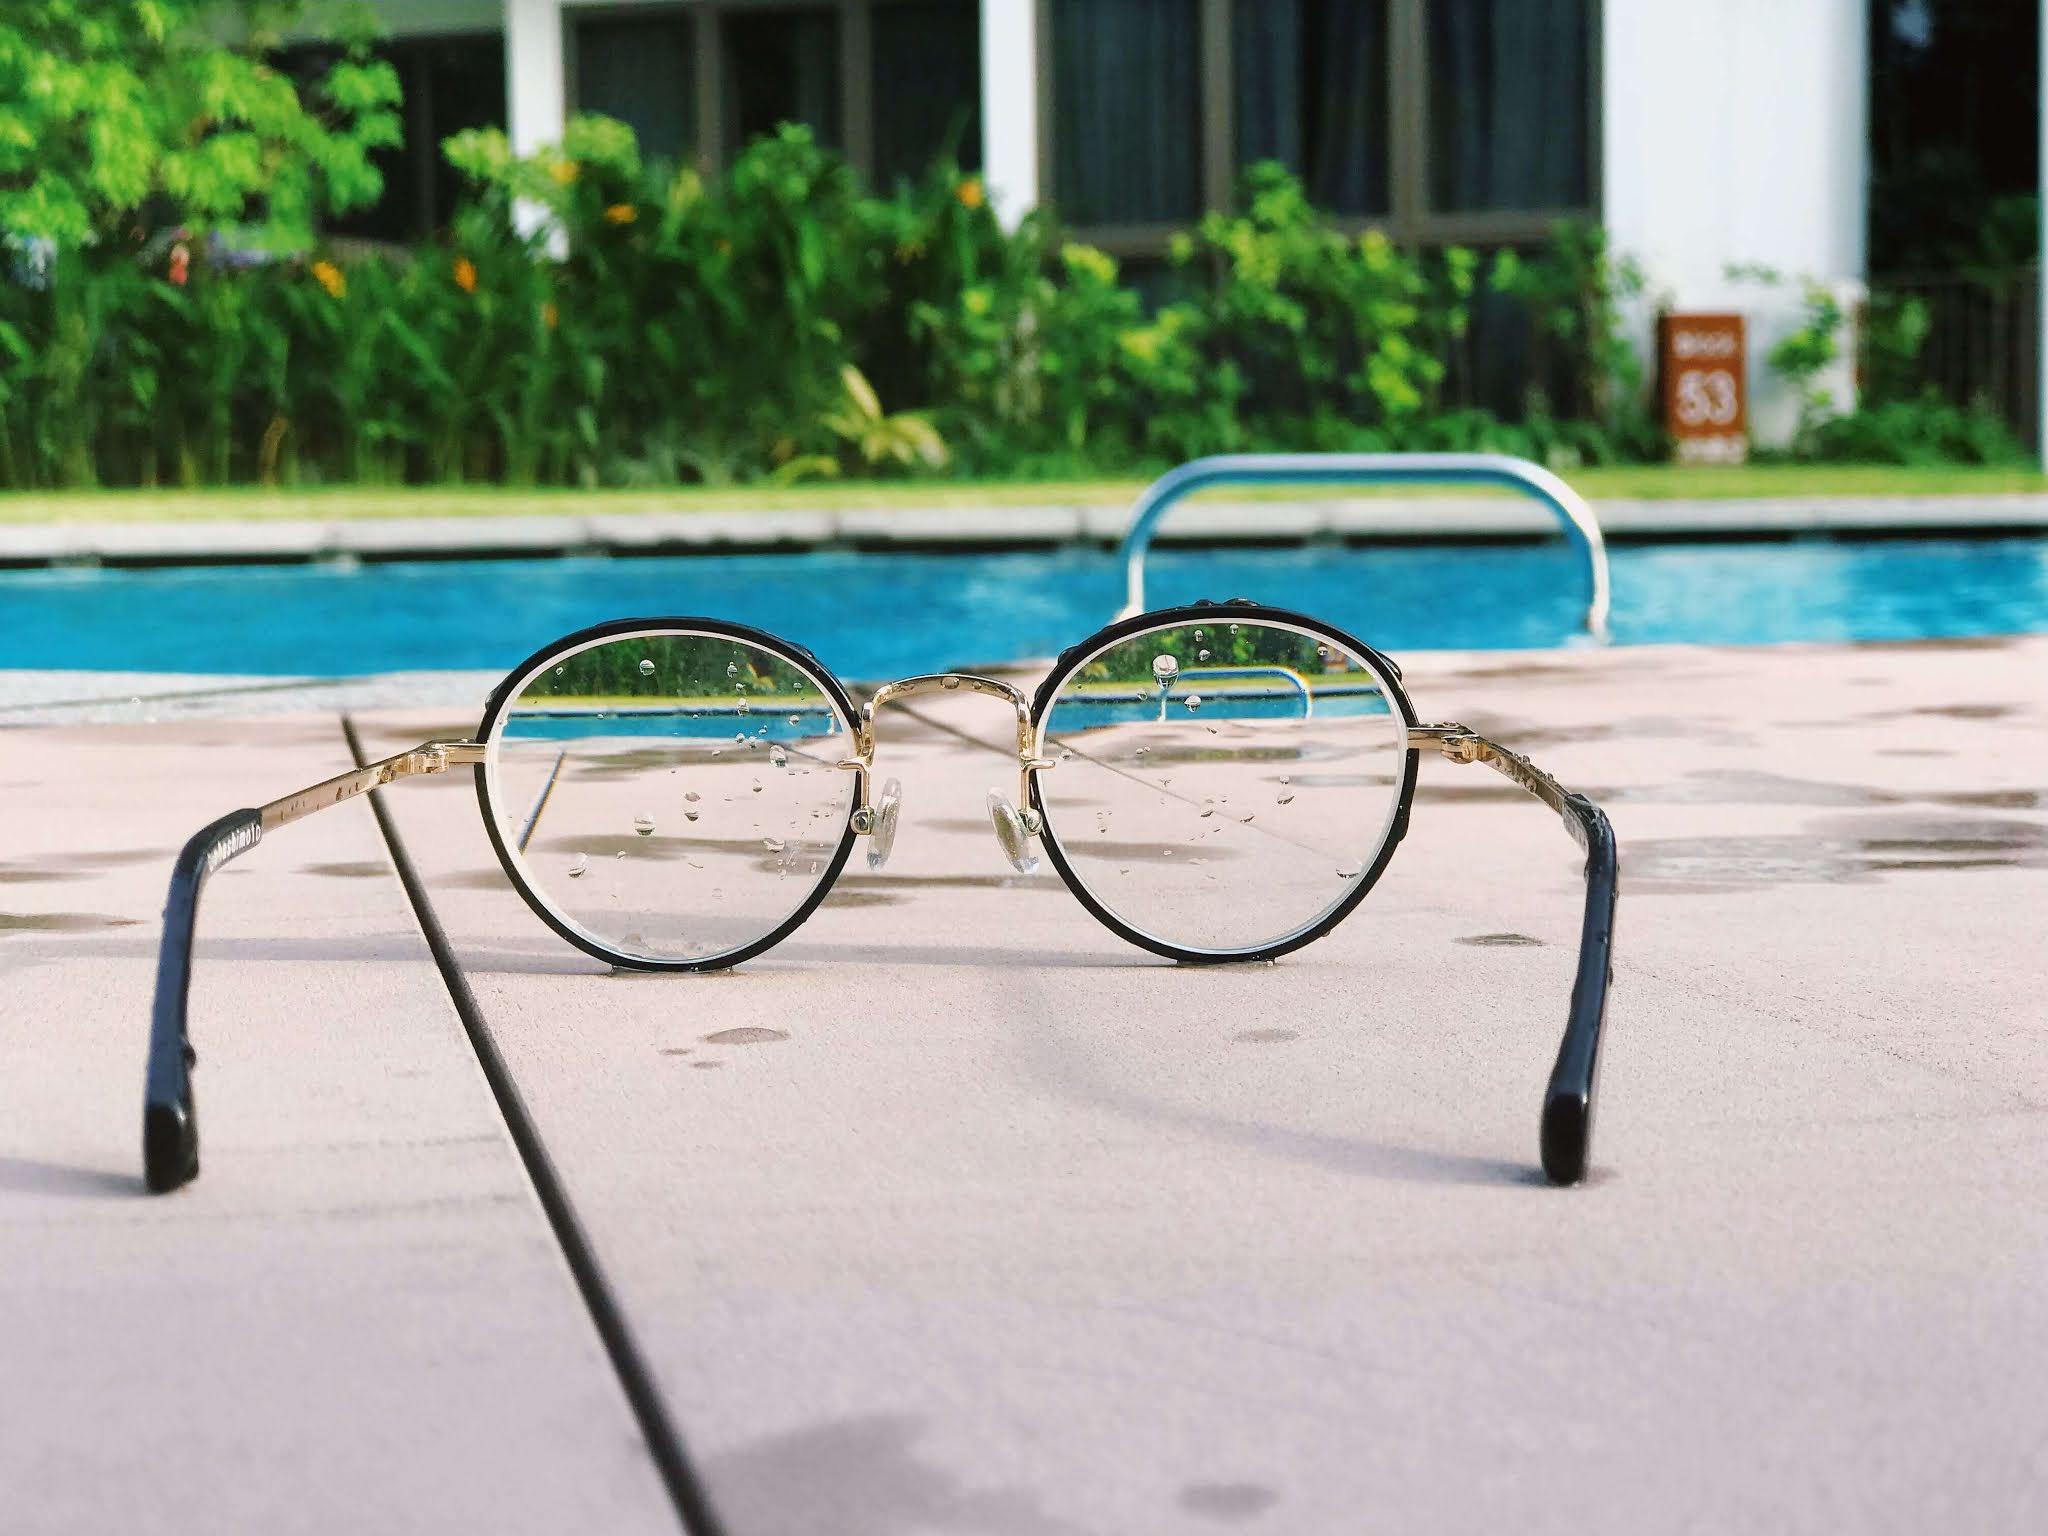 glasses, pool, perception, perspective, look,